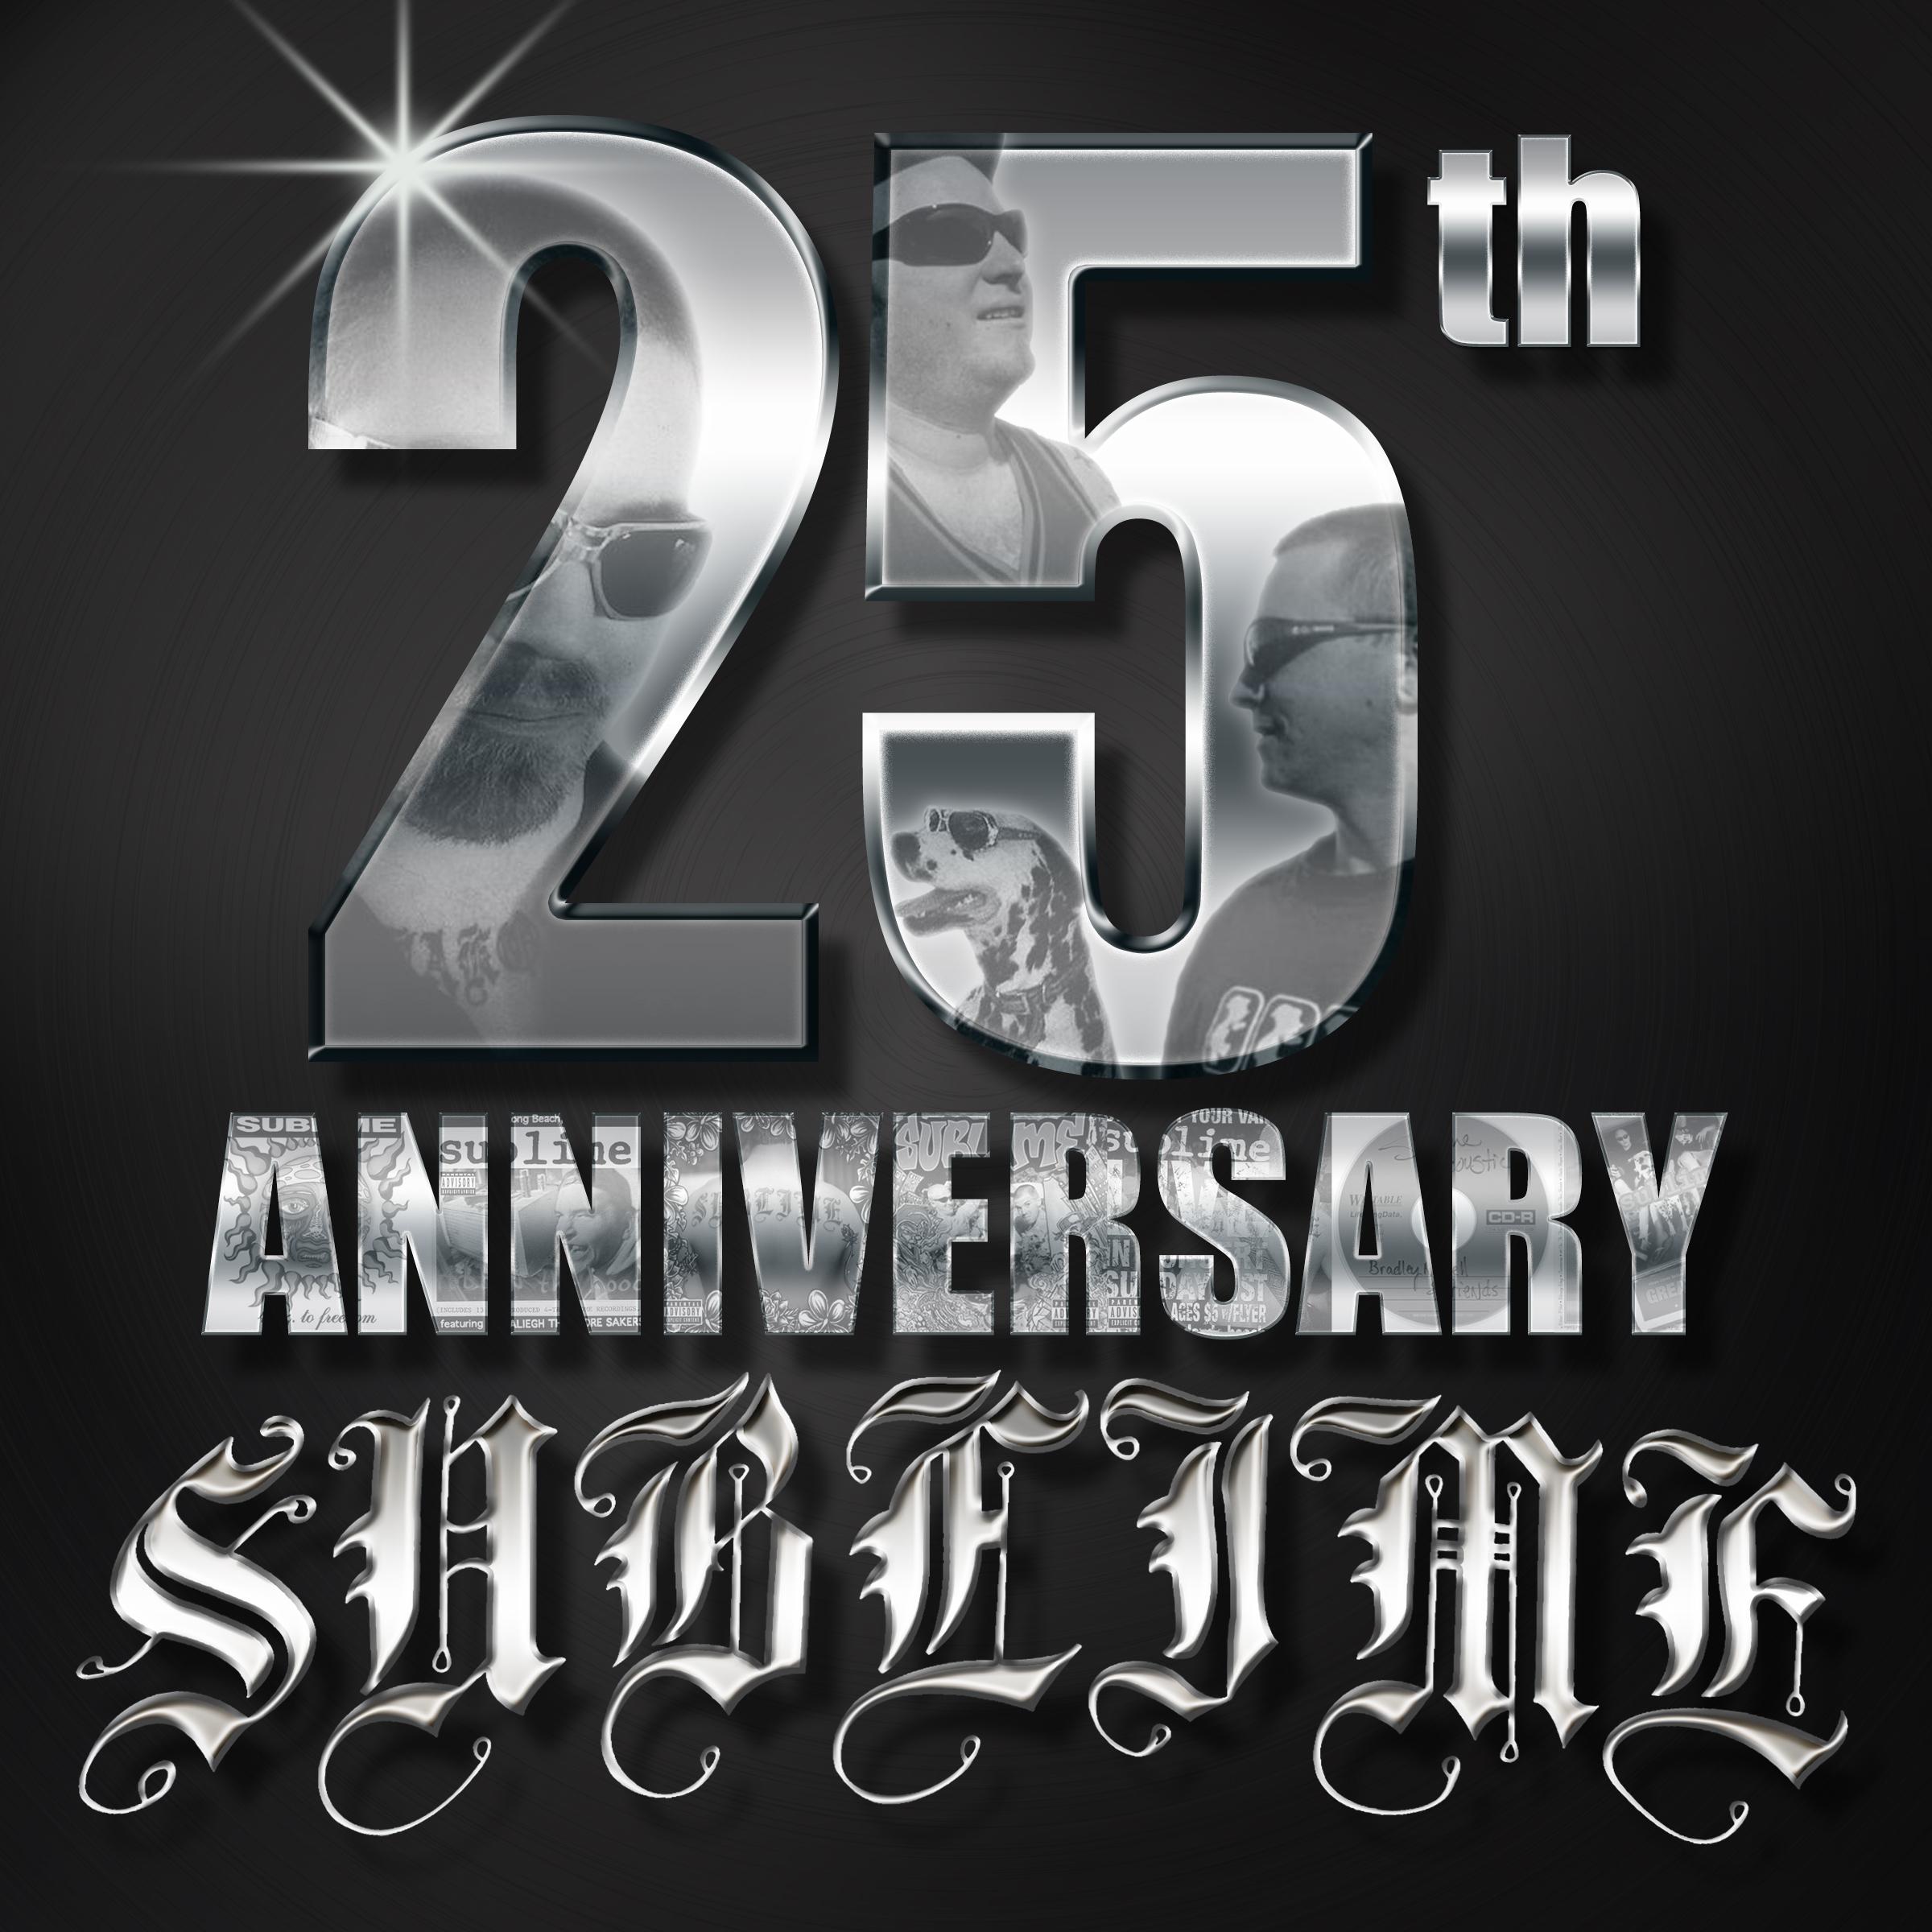 Sublime_Love_25th_Anniversary_Logo_v3.jpg